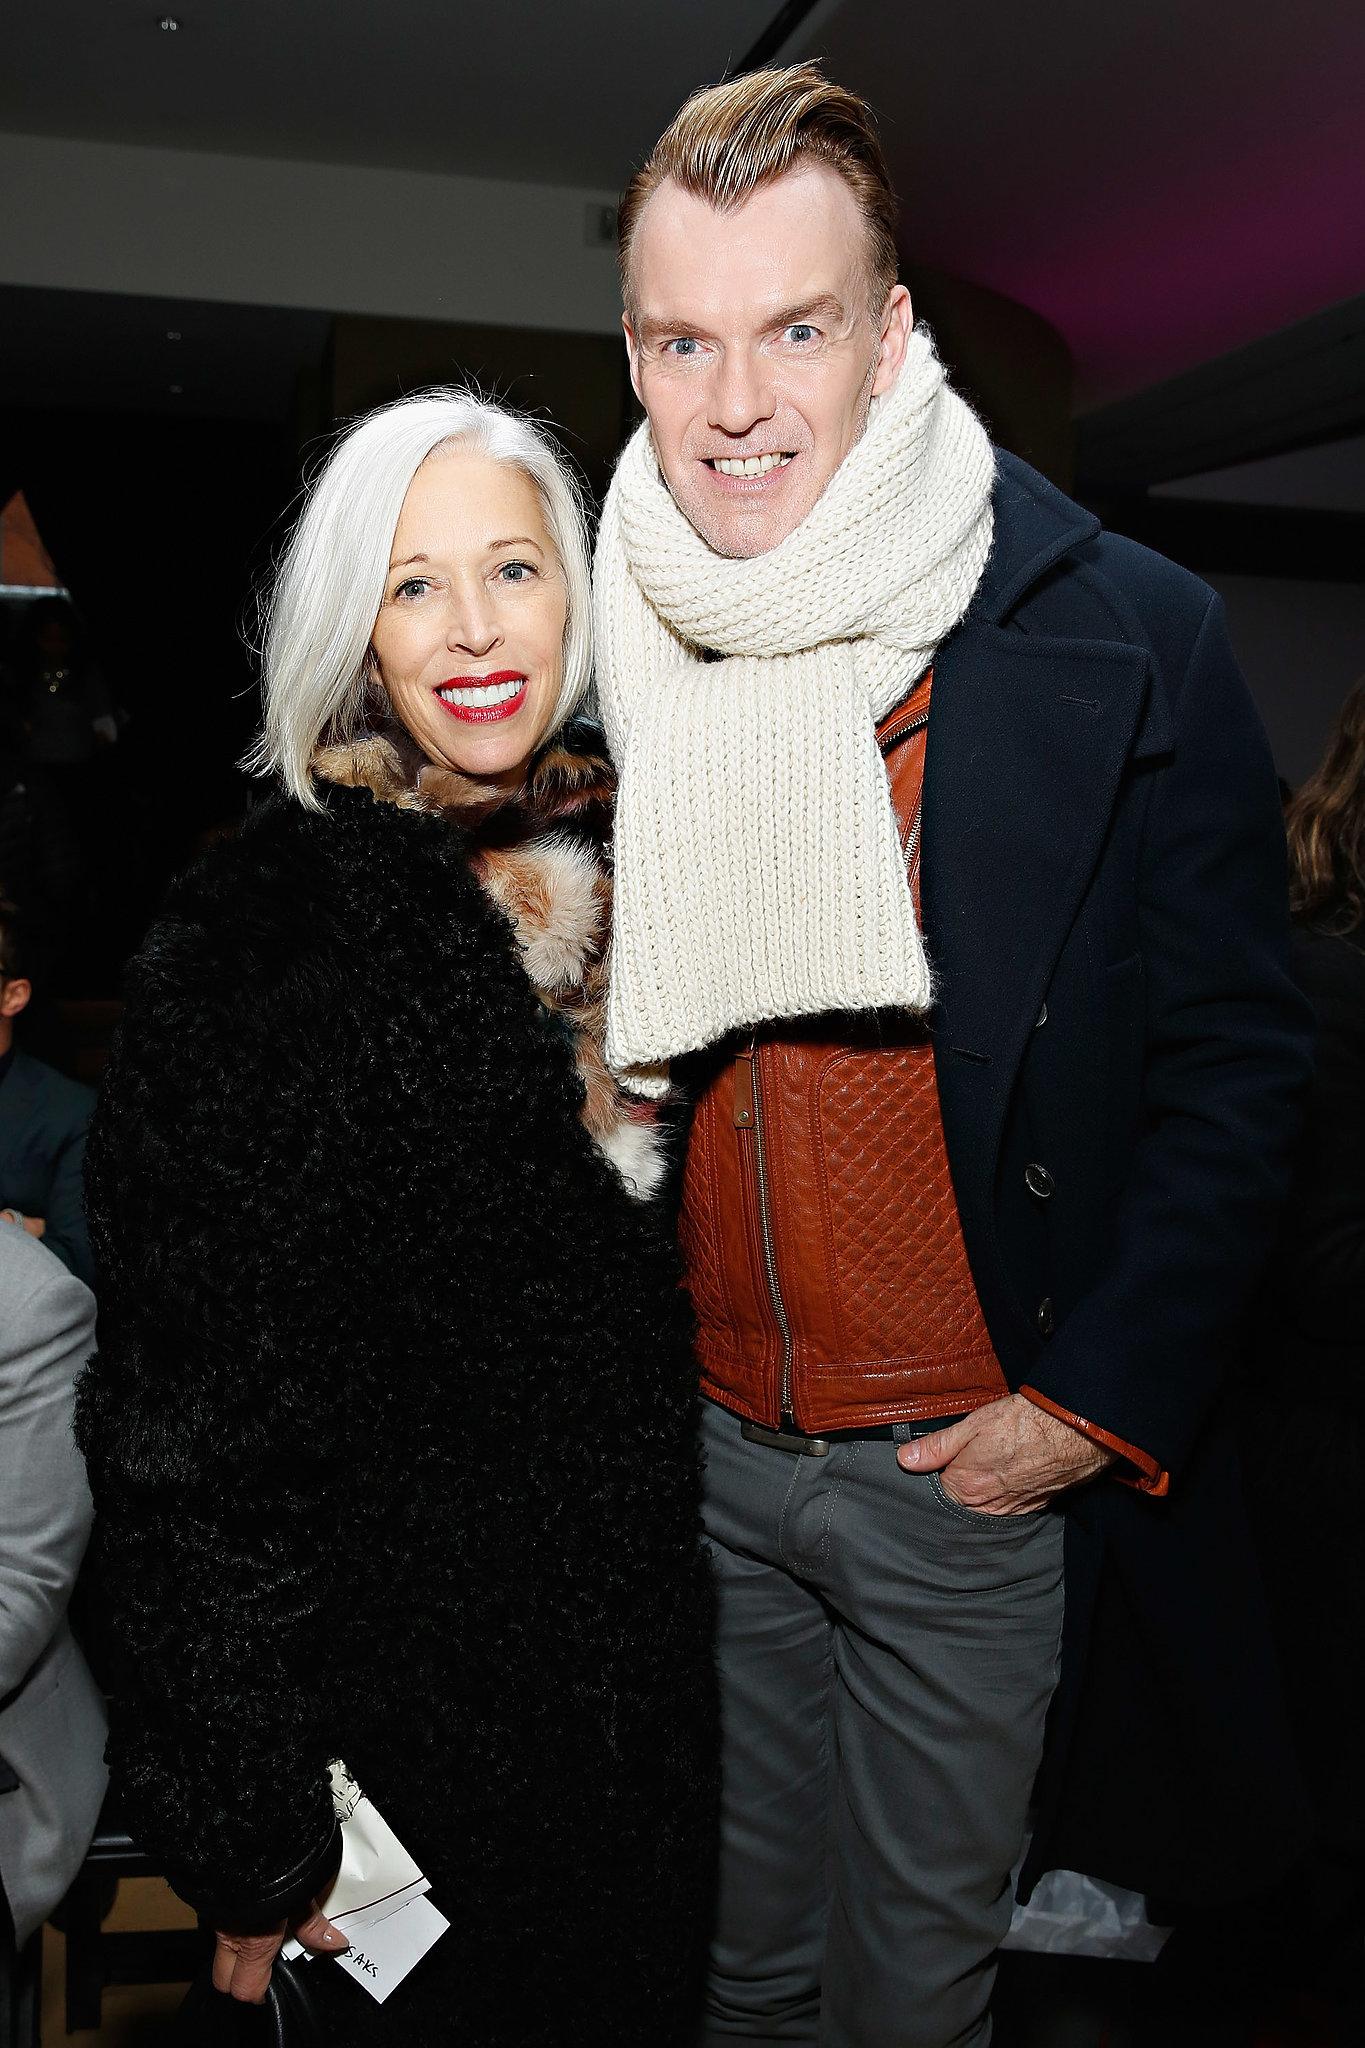 Linda Fargo and Ken Downing at Michael Bastian's Fall 2014 show.